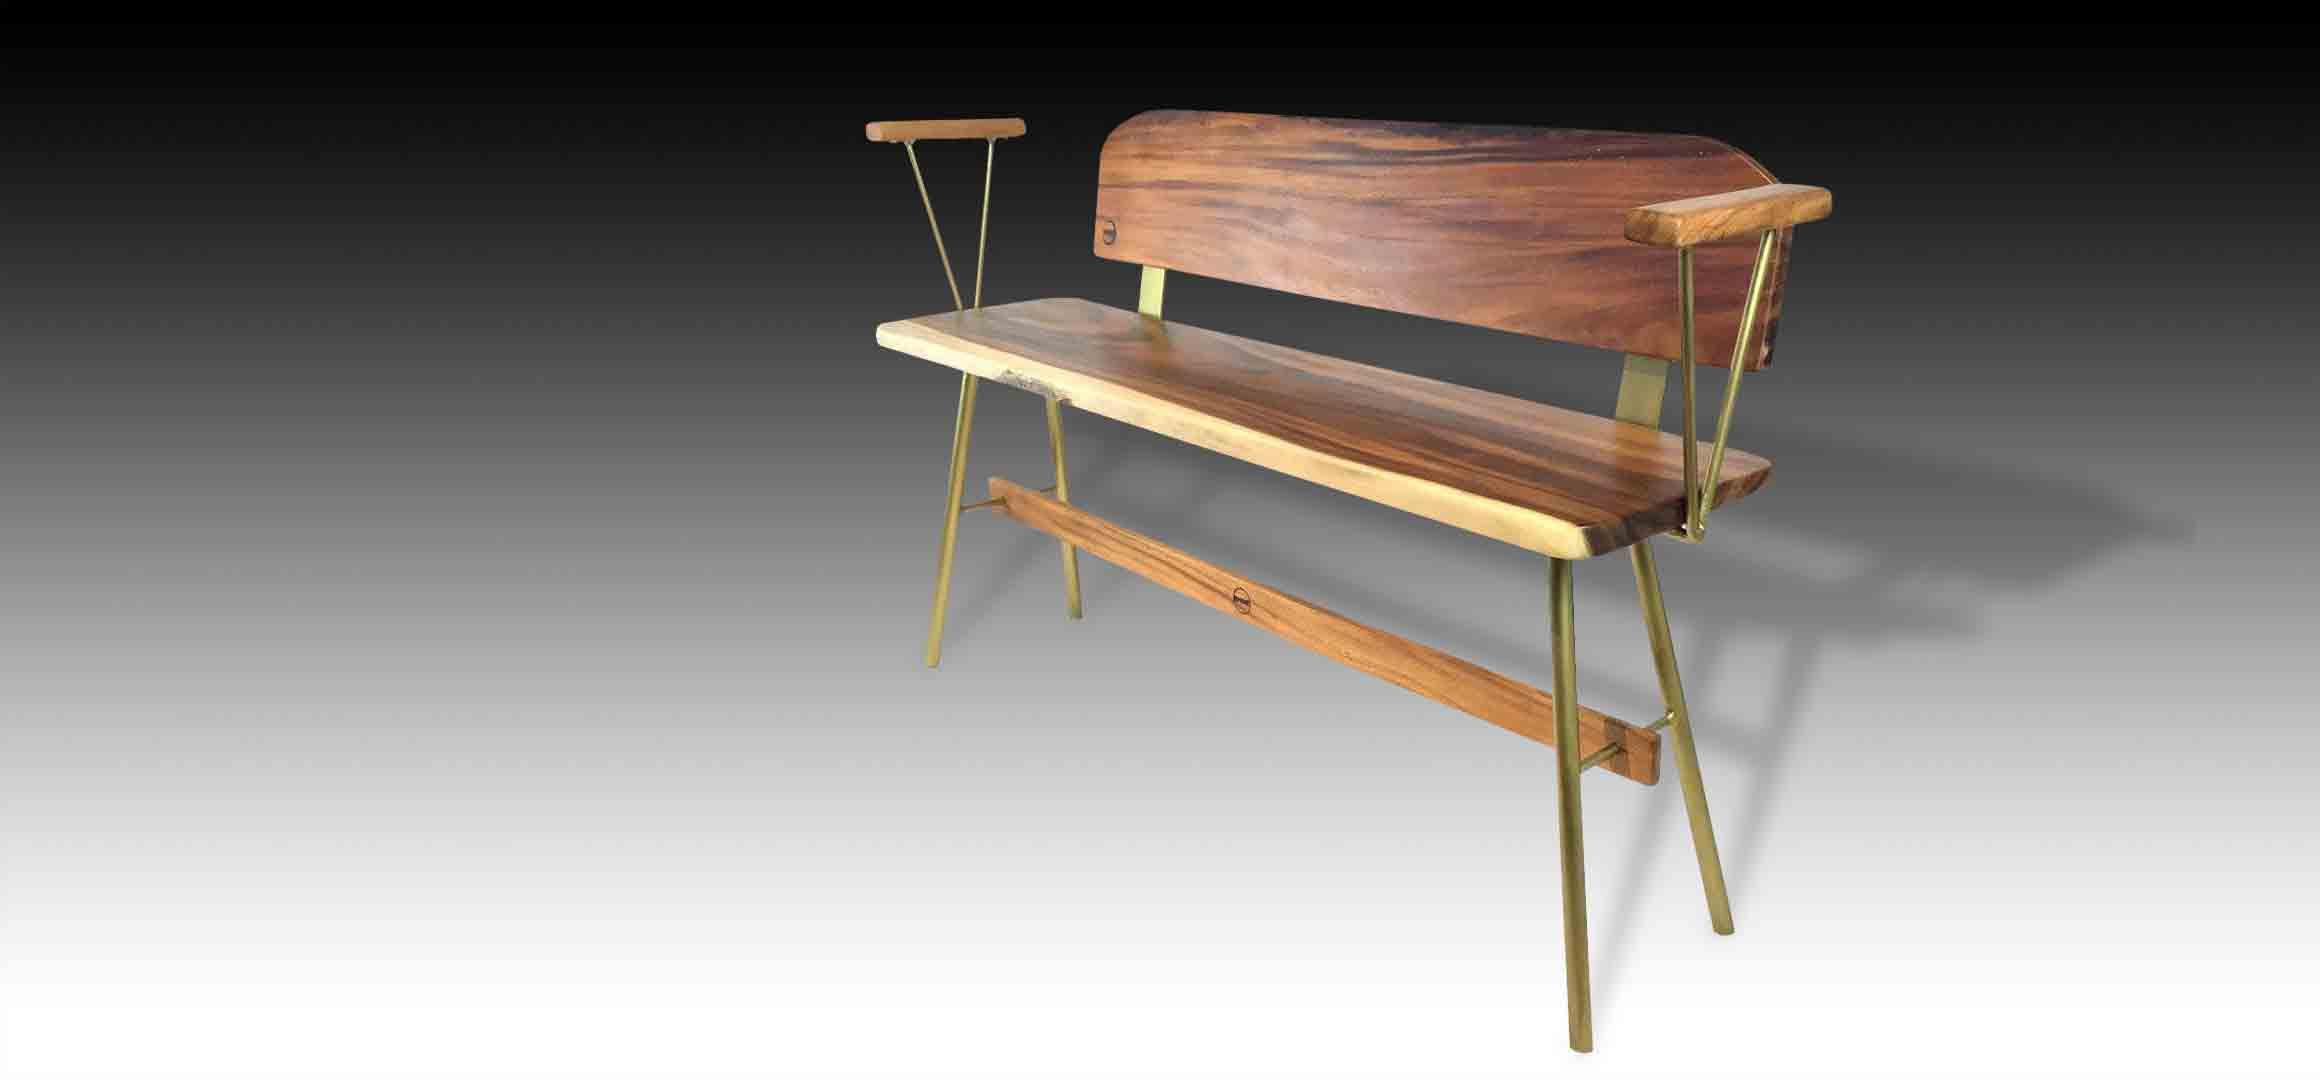 Vernon Gold Suar wood Bench diagonal view